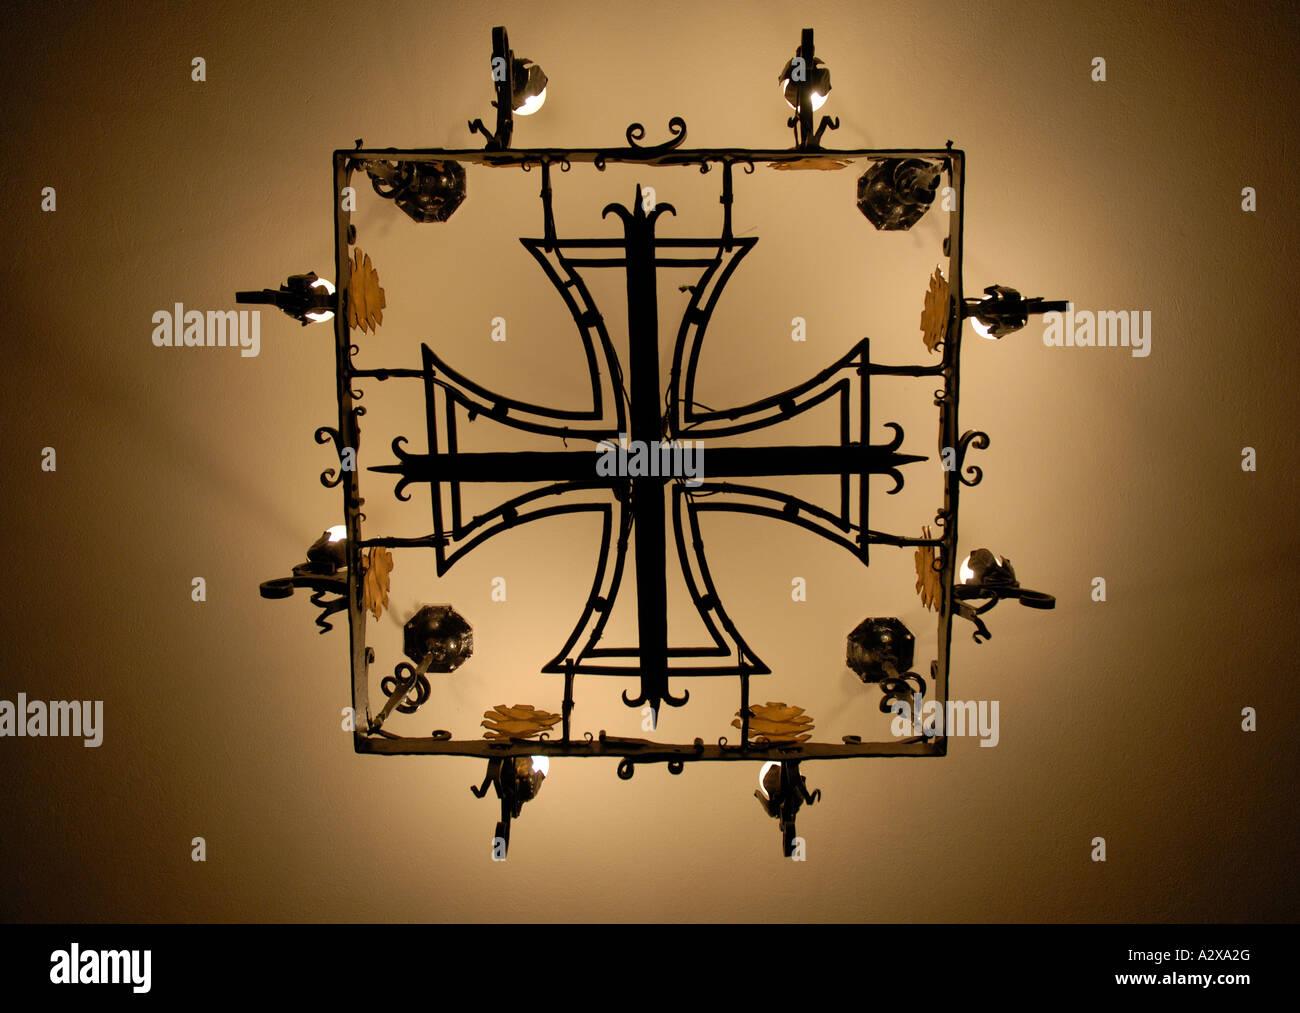 Iron cross shaped chandelier in Nazi era church, Berlin - Stock Image